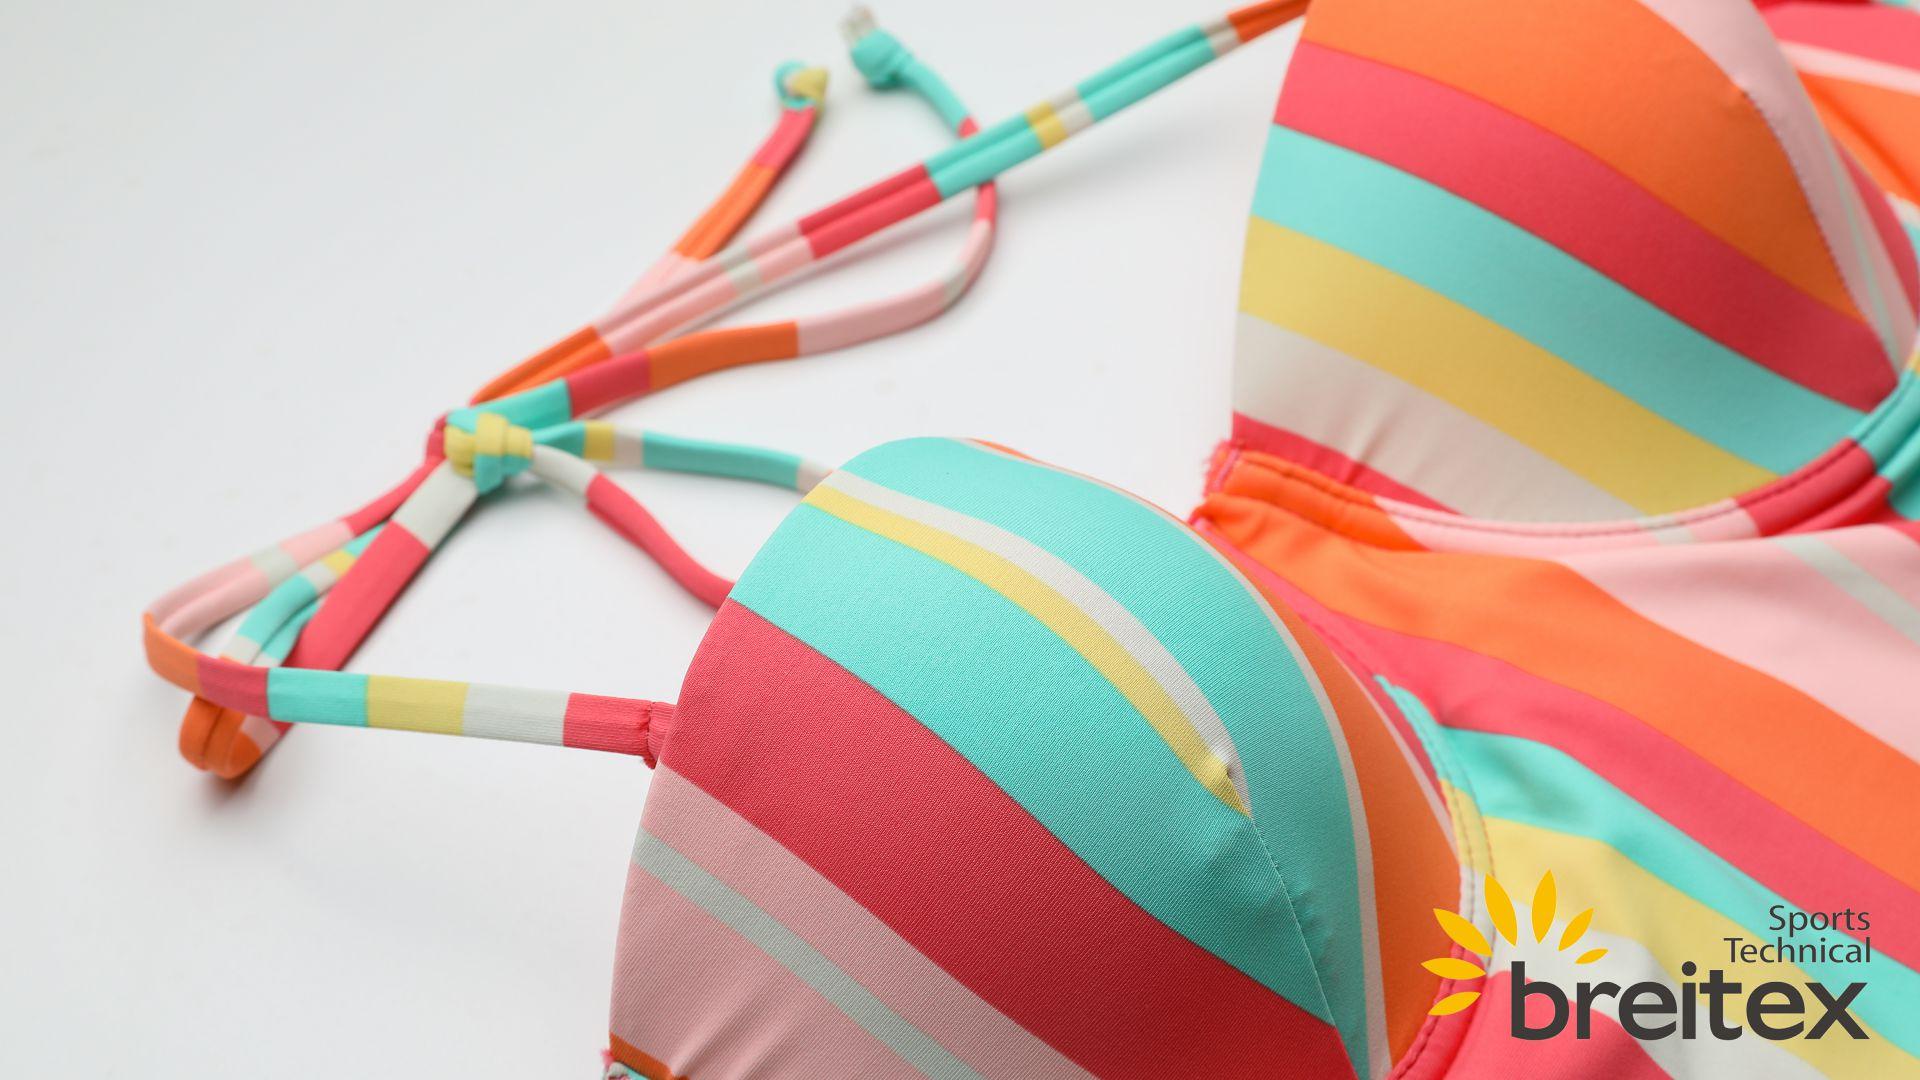 product-Ladies swimwear, the contrast color swimwear, striped tankini set, two-piece bikini-Breitex